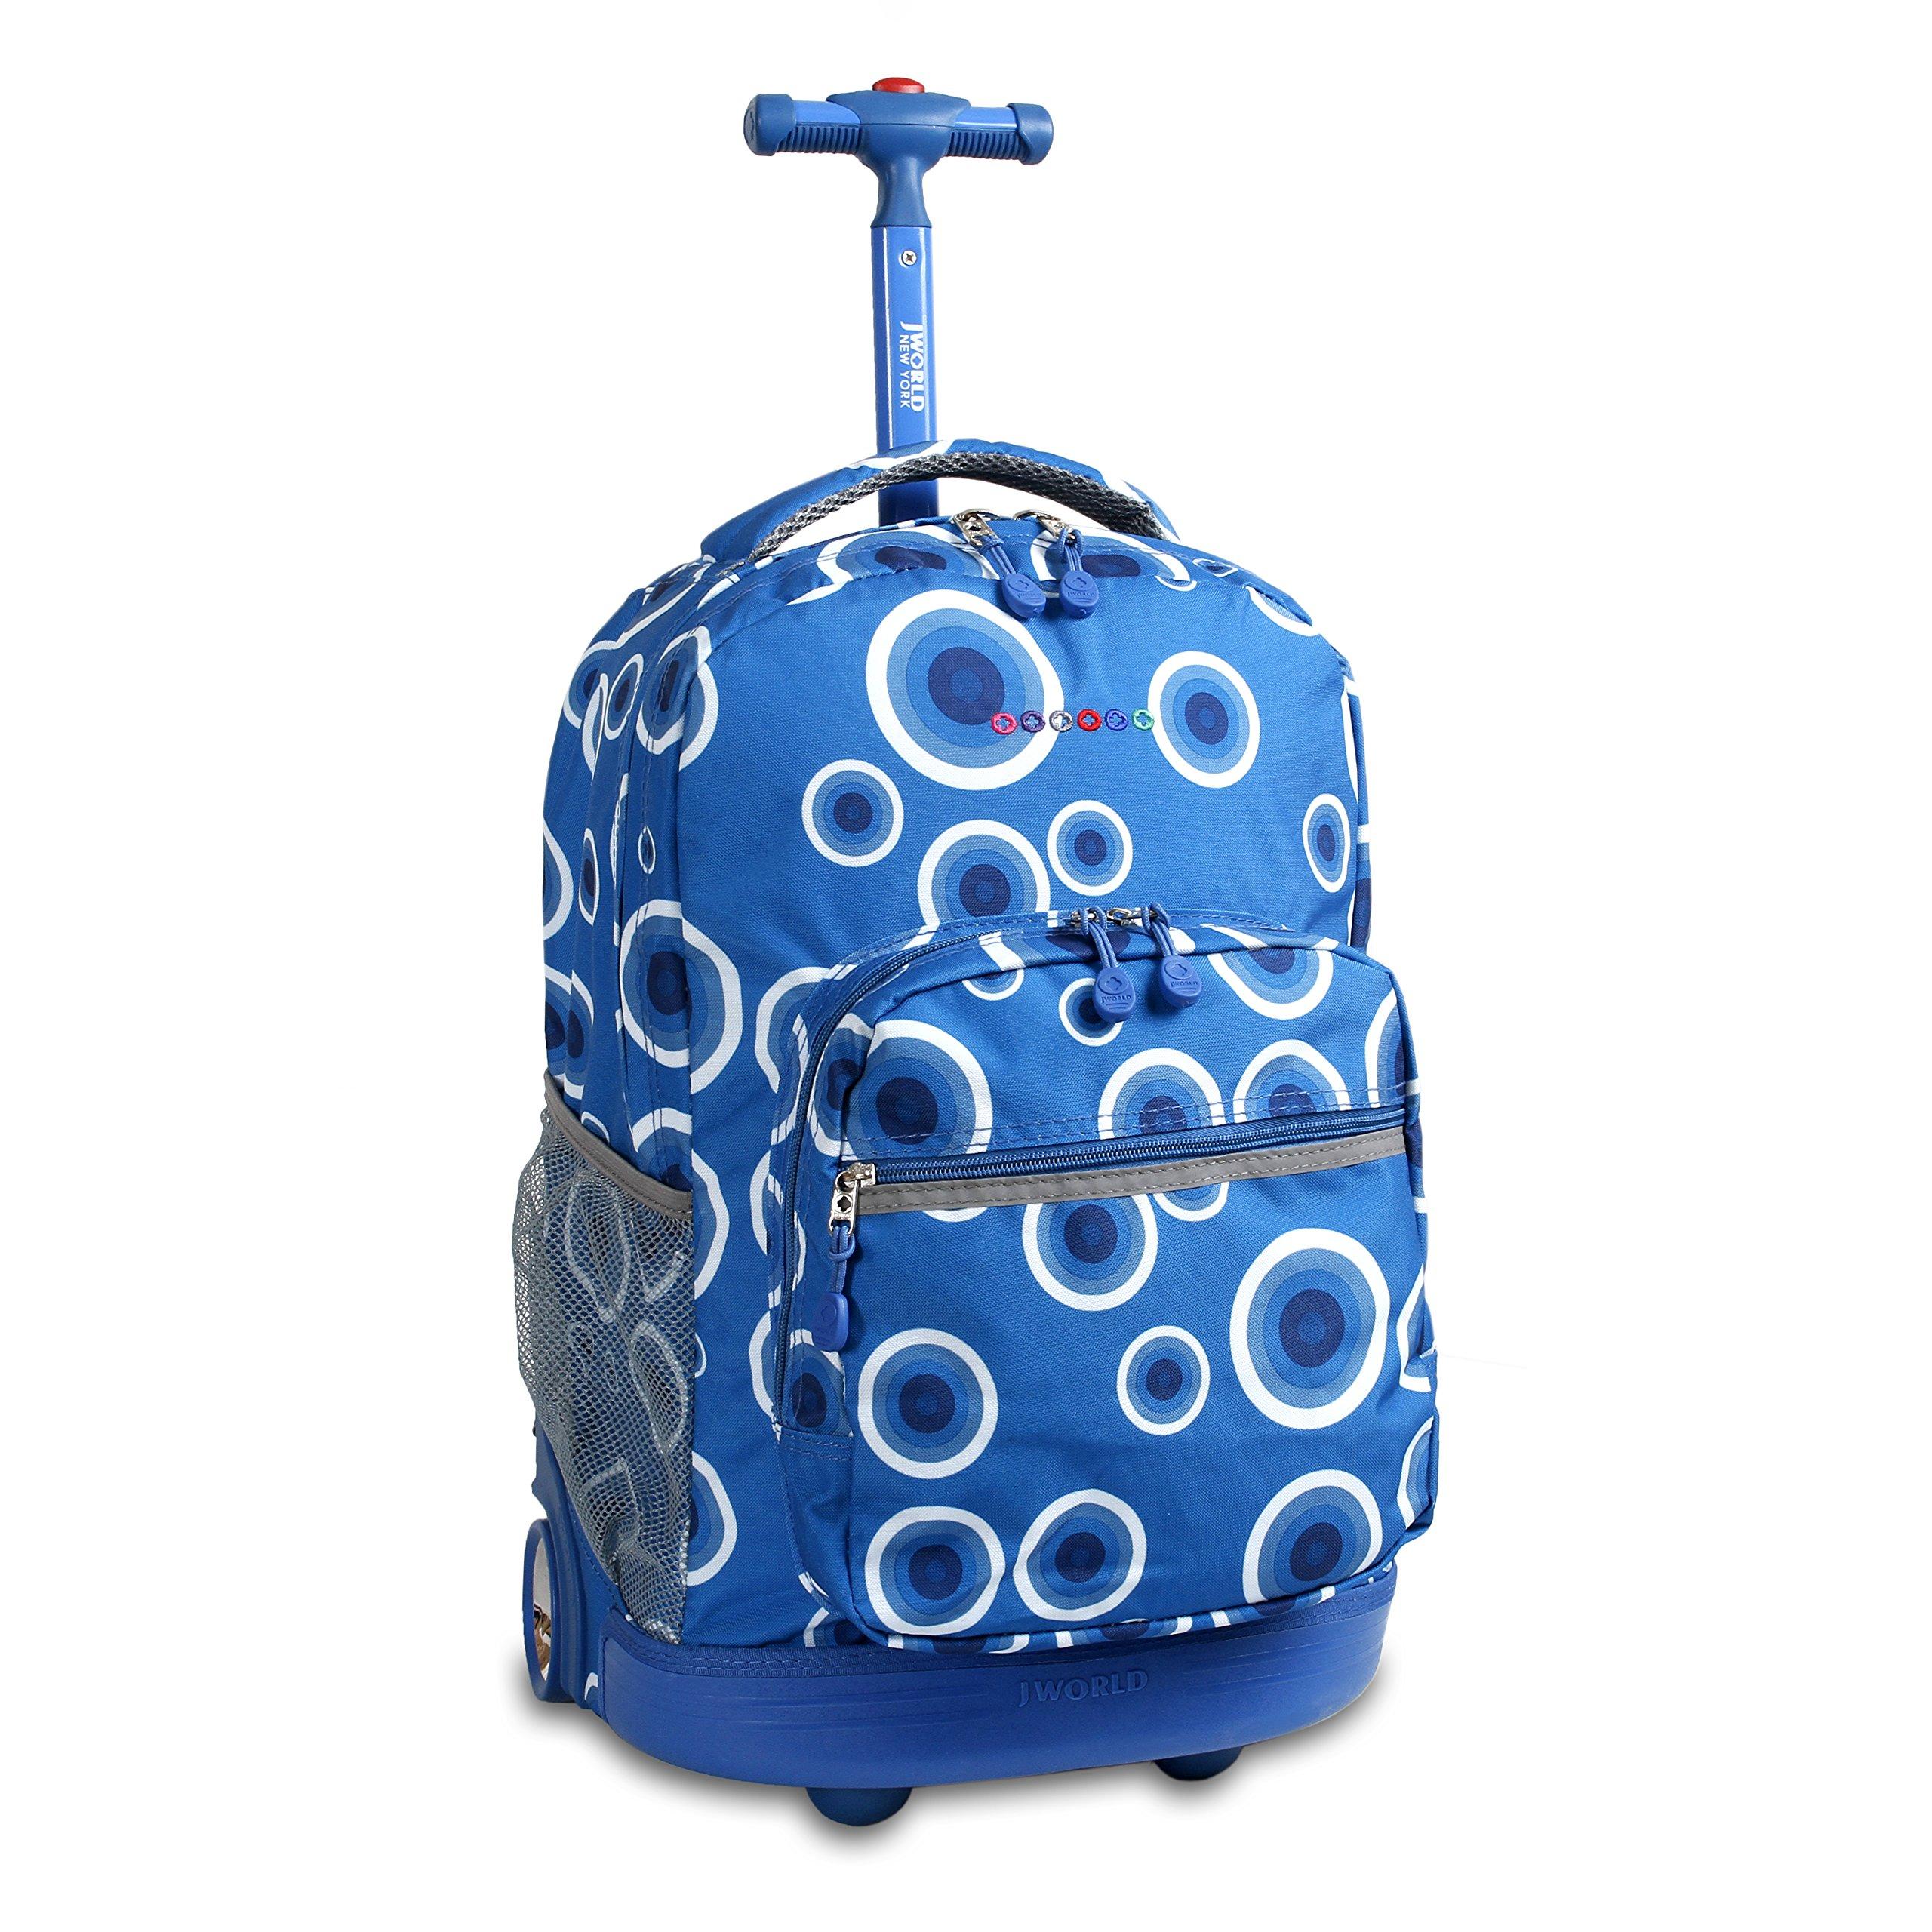 J World New York Sunrise Rolling Backpack, Blue Target, One Size